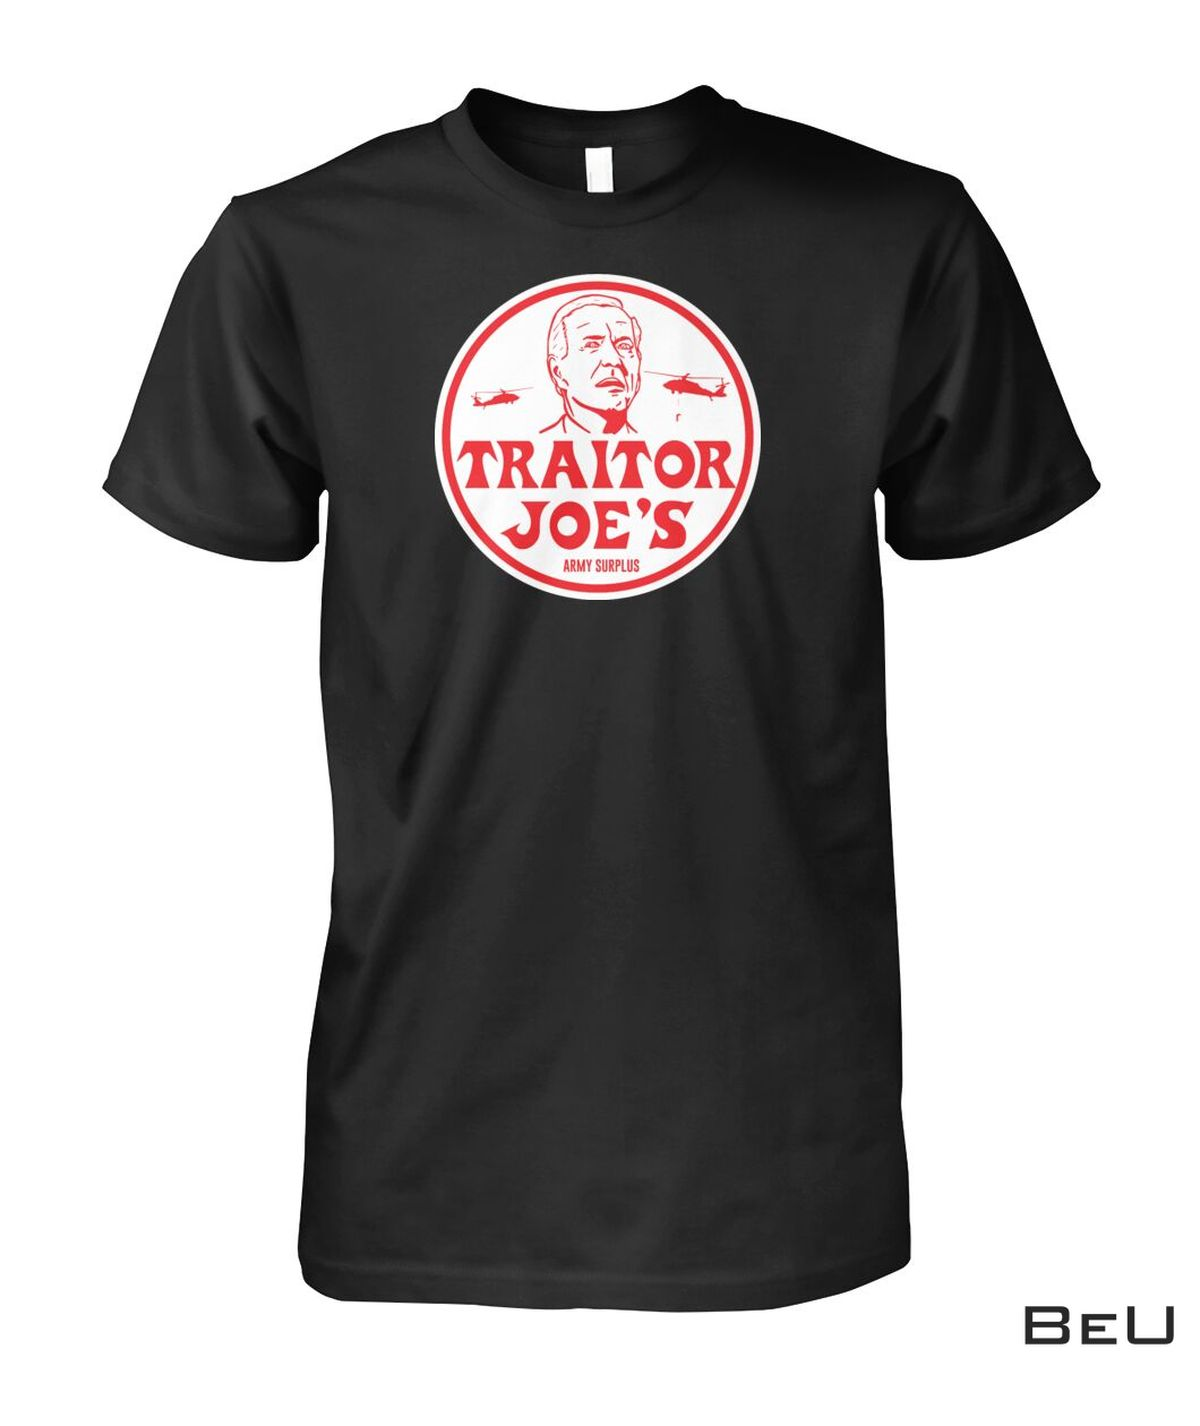 Traitor Joe's Army Surplus Shirt